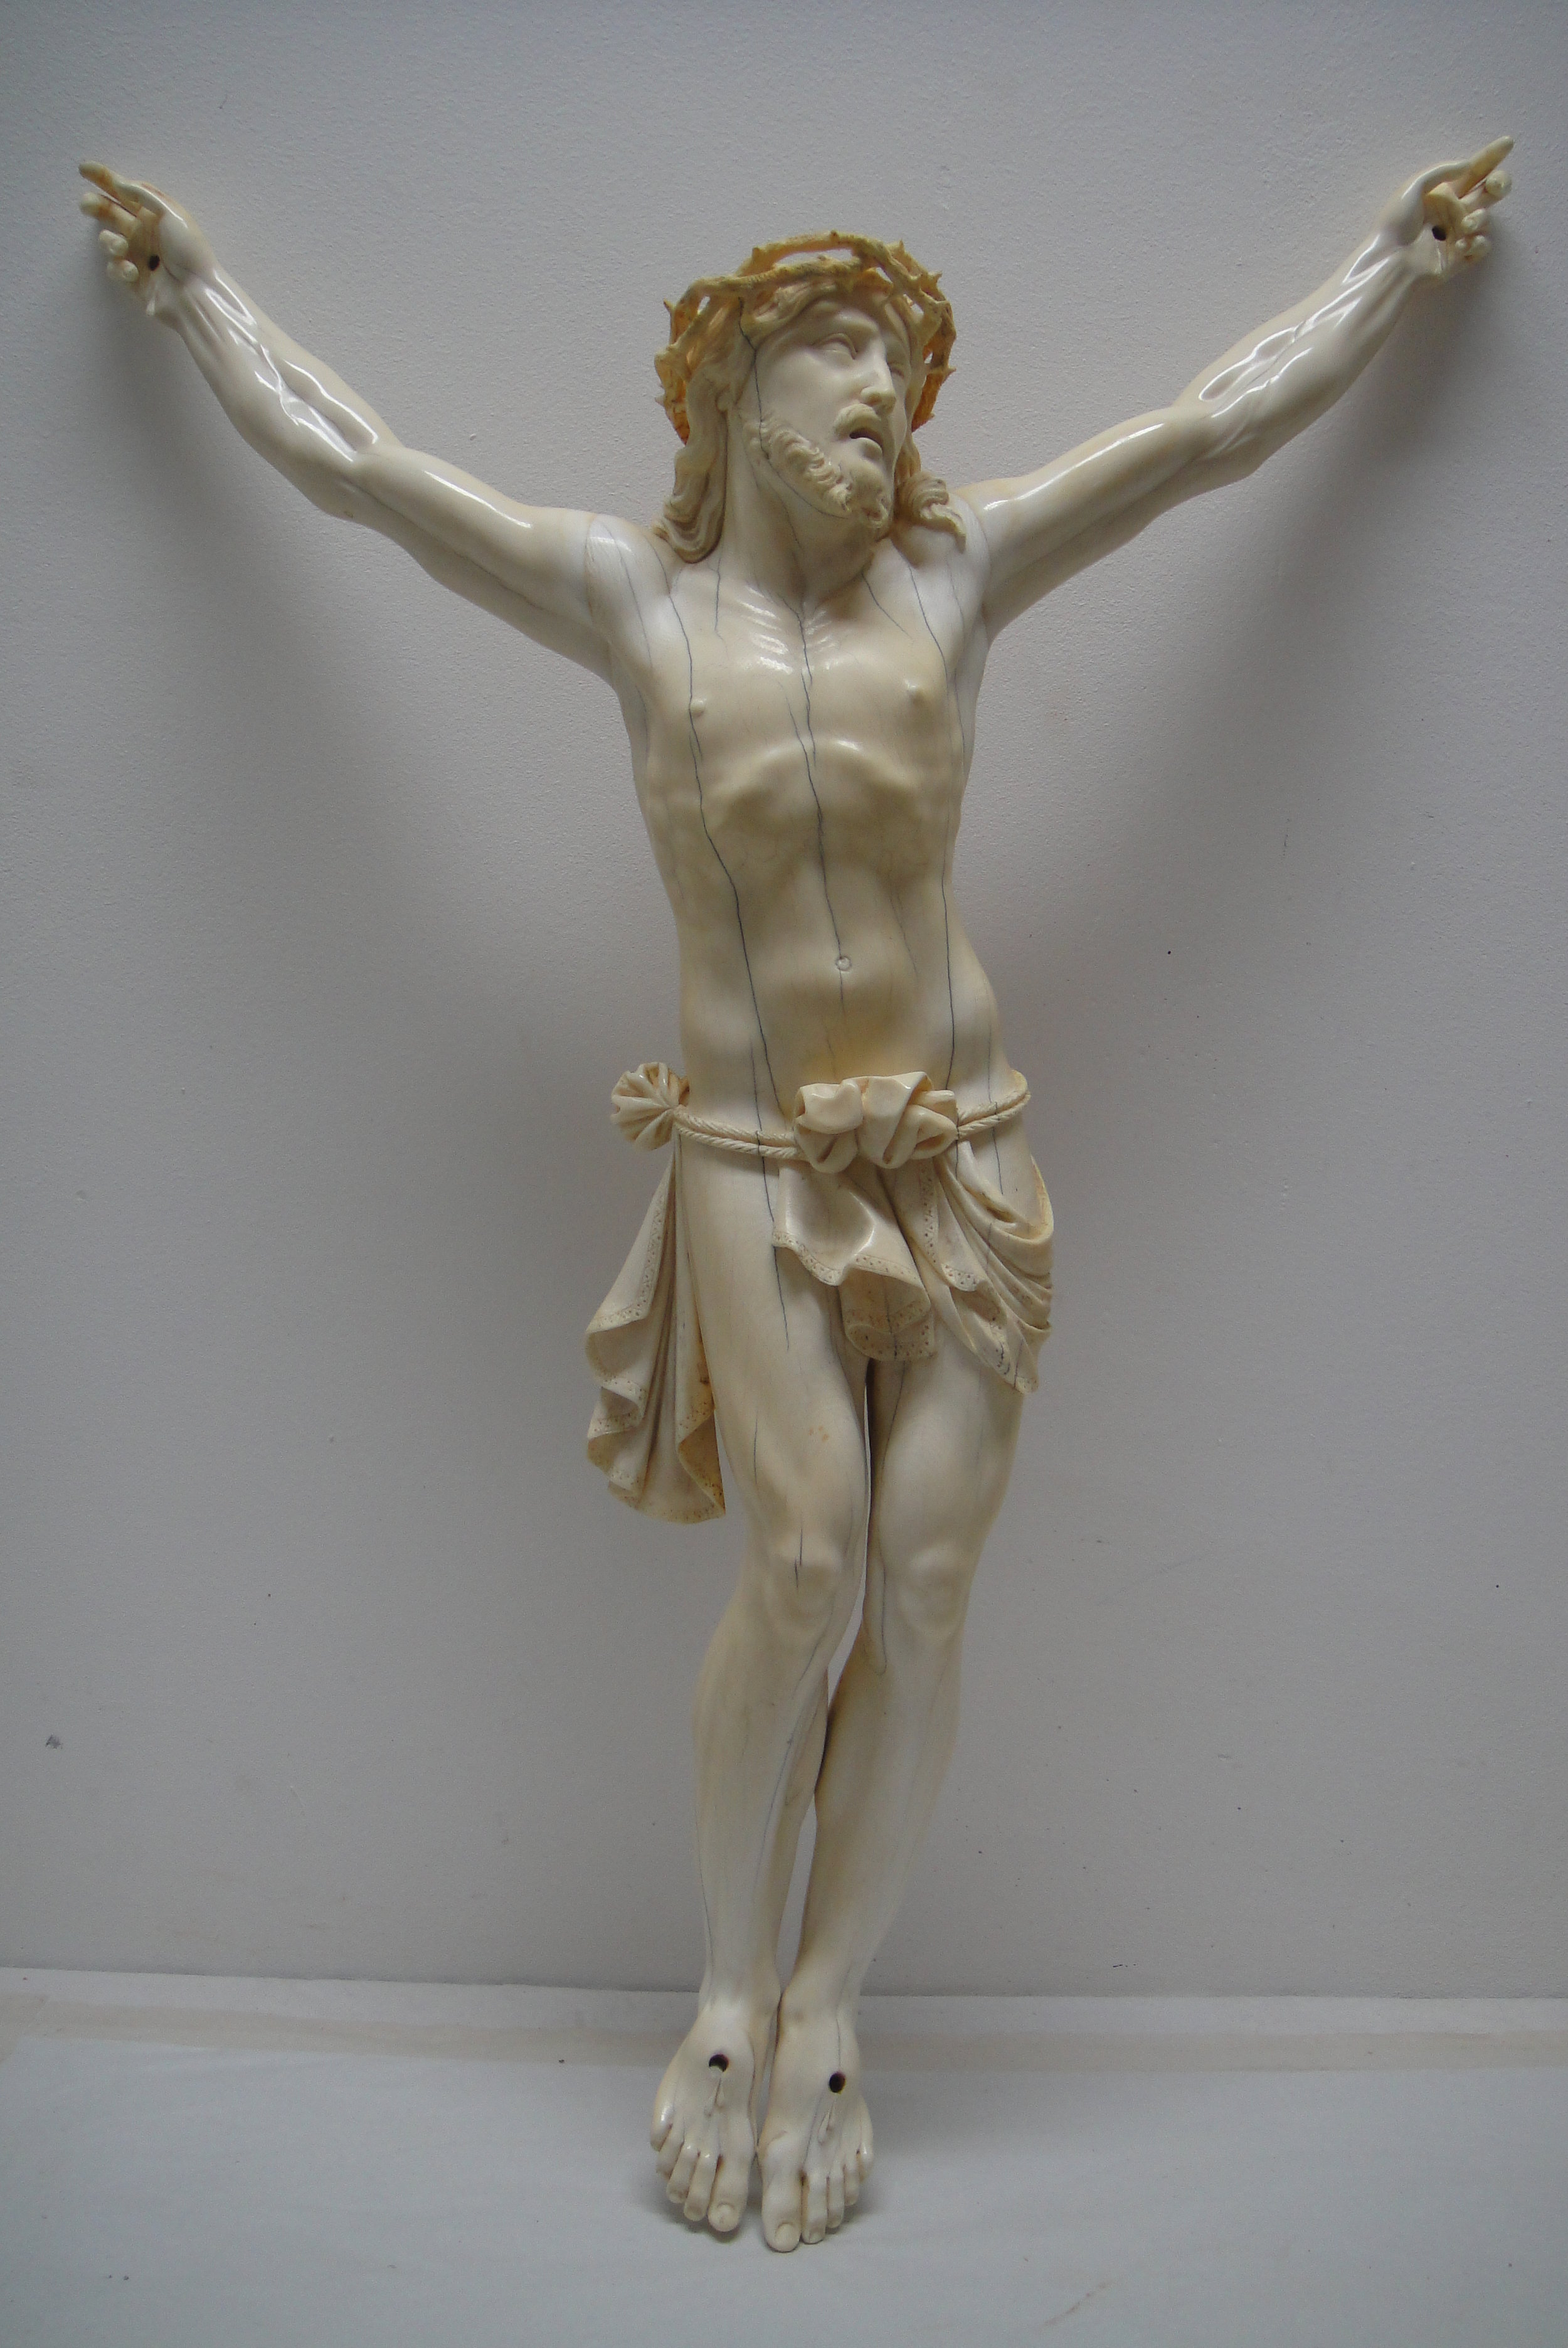 christ-ivoire-chapelle-versailles-restauration-reparation.JPG